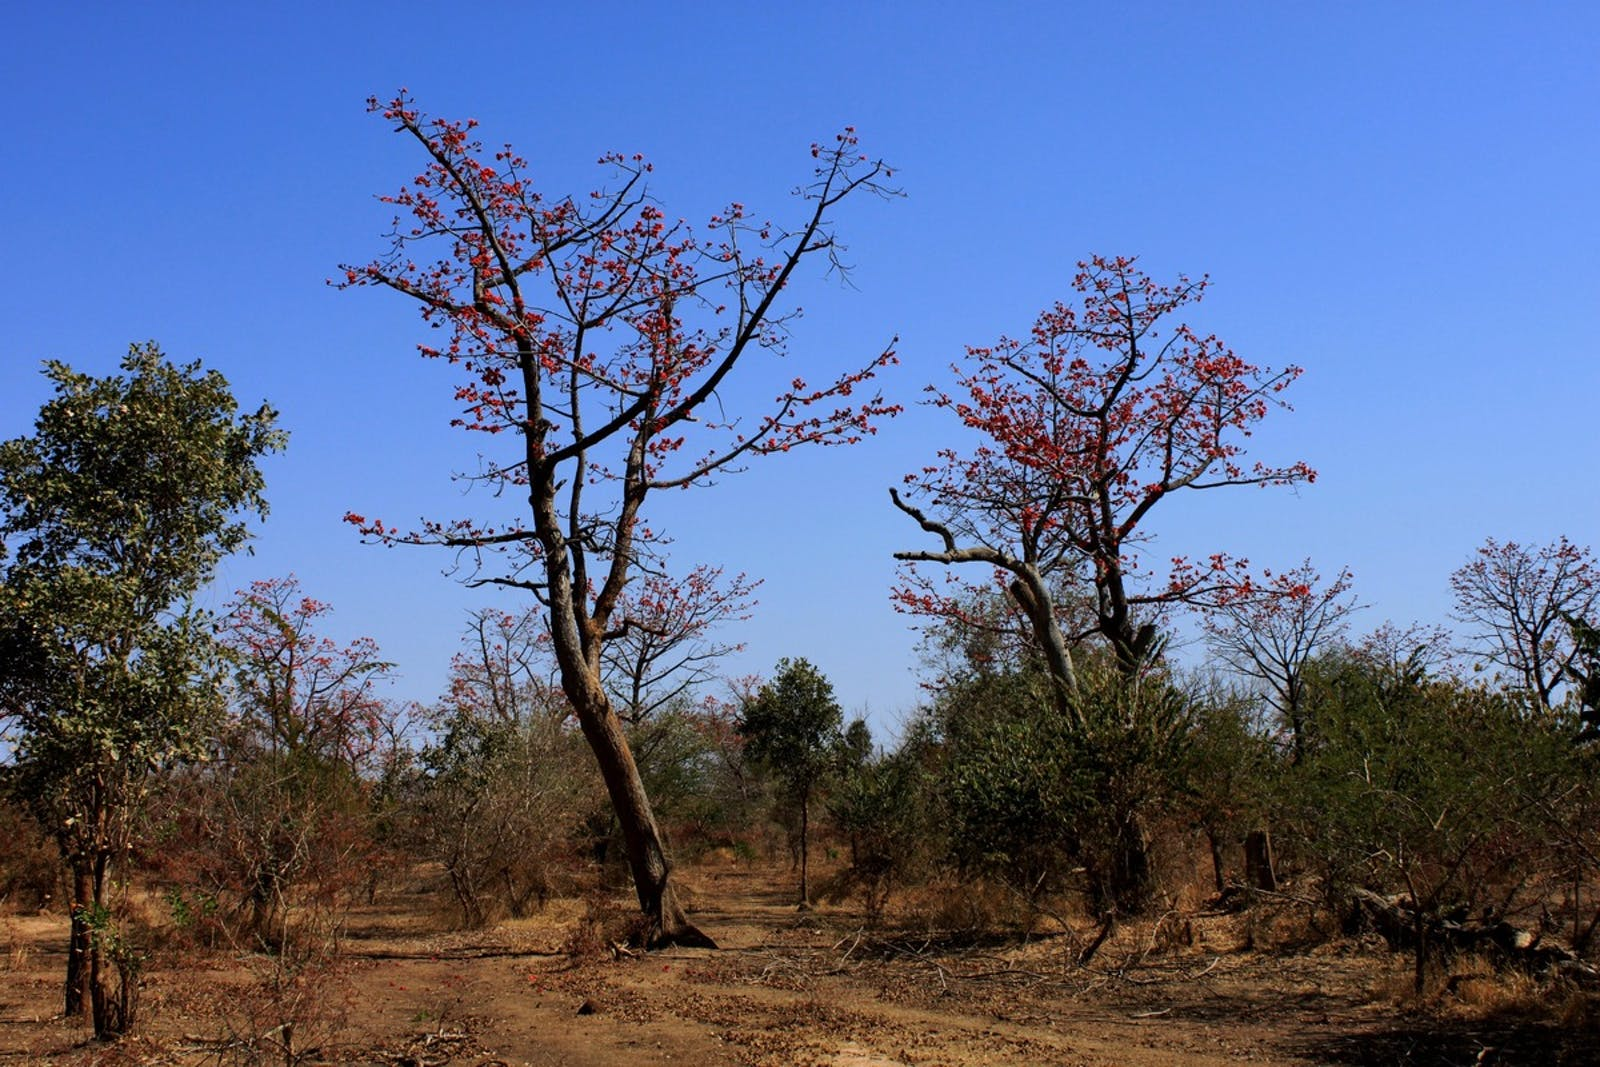 West Sudanian Savanna